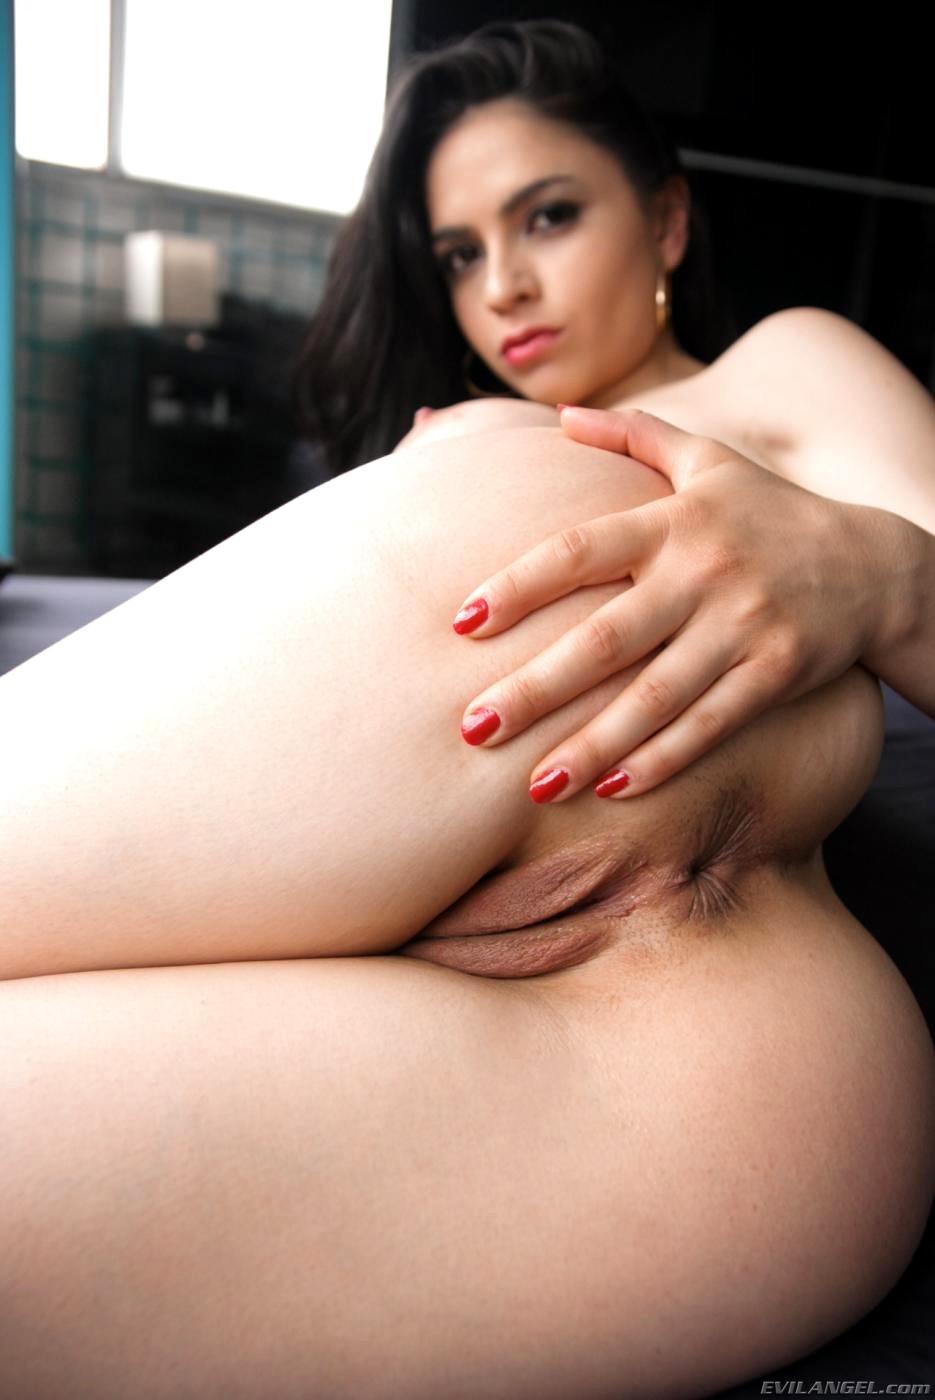 Emily procter lesbian sex porn